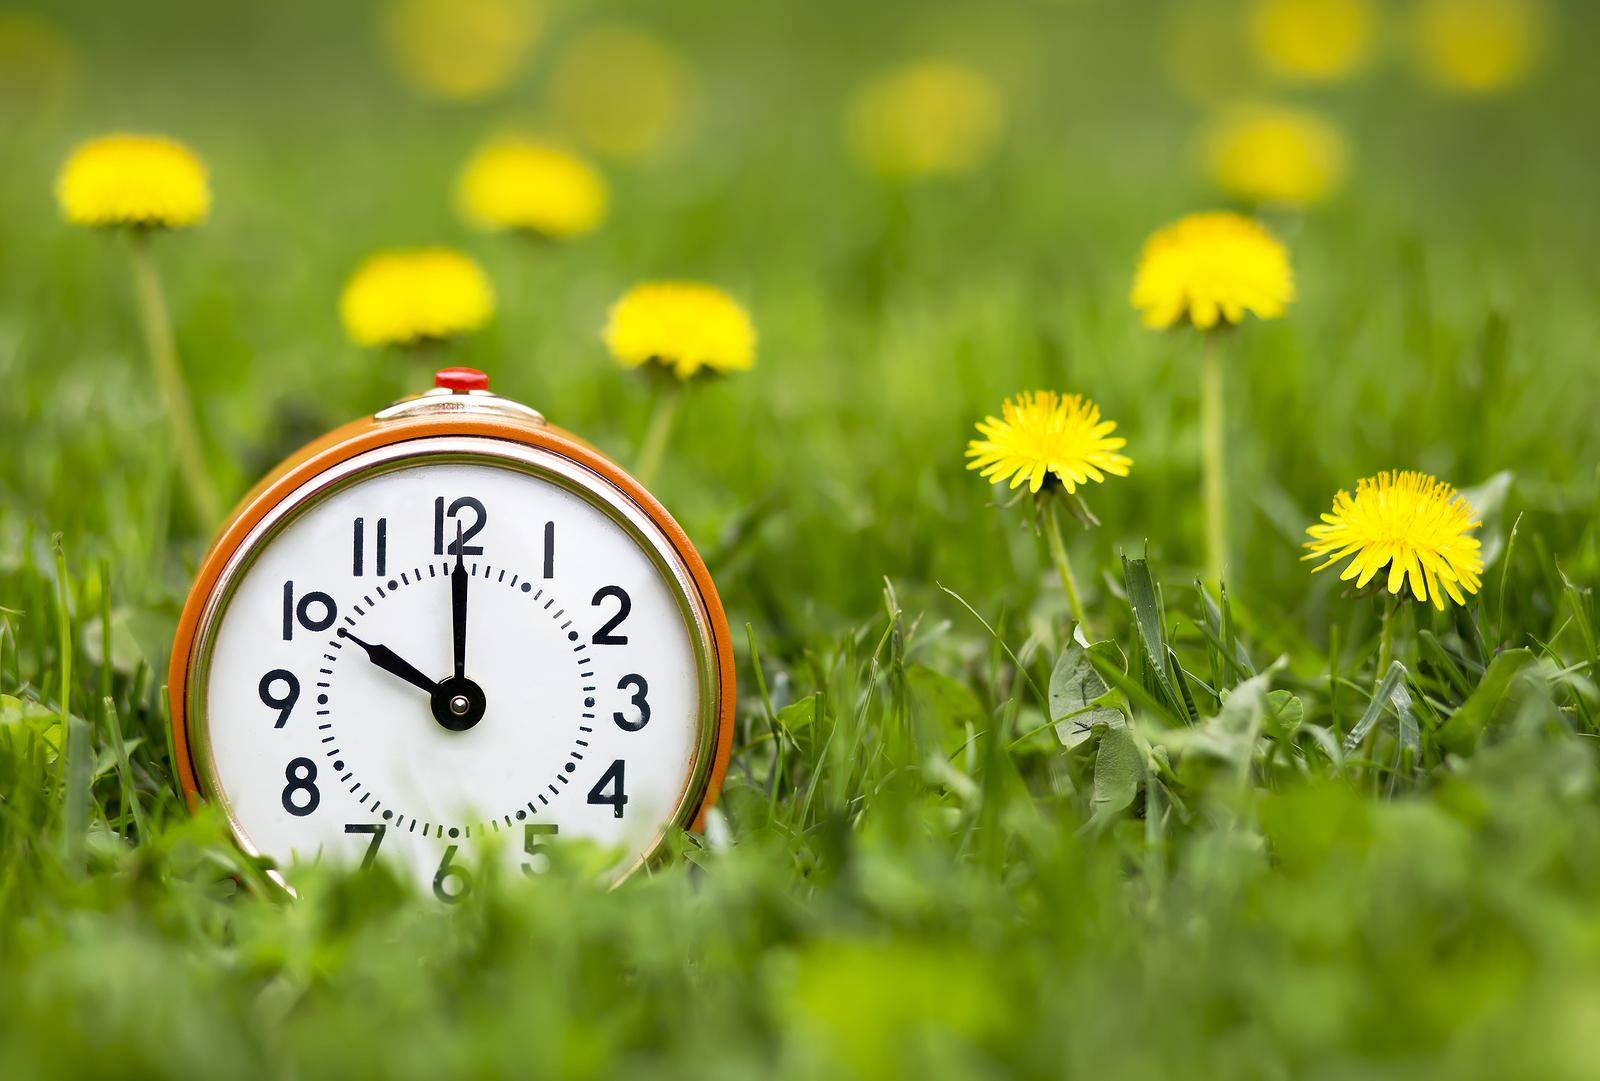 Change Your Clocks, Spring forward